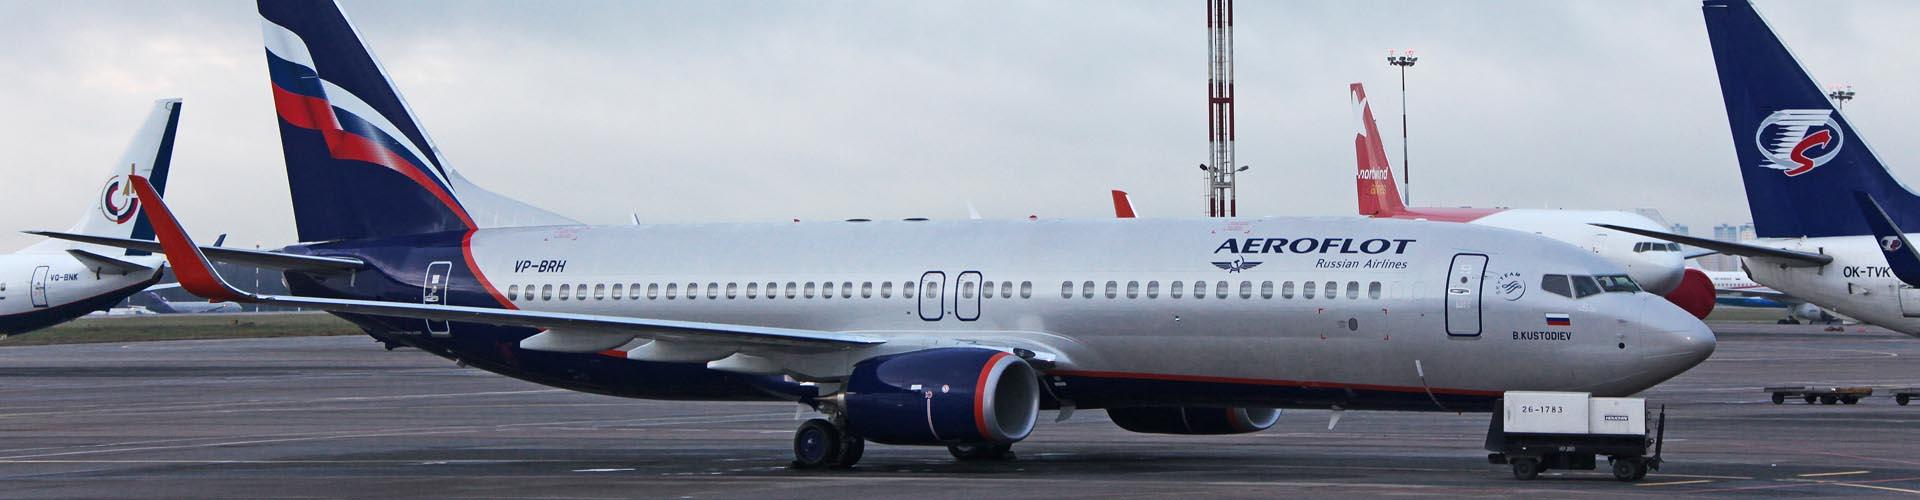 Боинг 737 схема салона лучшие места фото 36